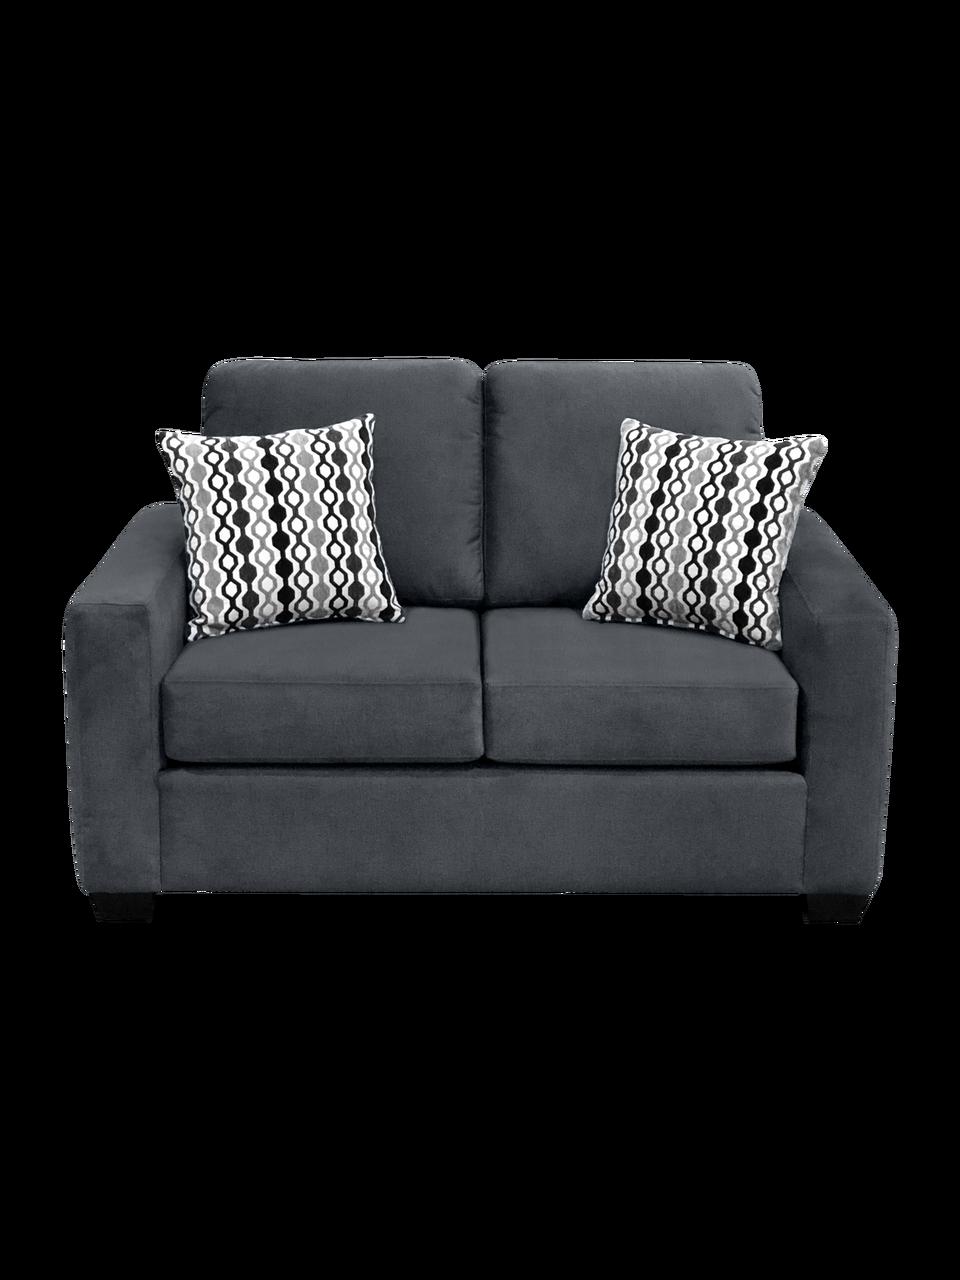 Nordel Fabric Loveseat Sofa Bed Pebble